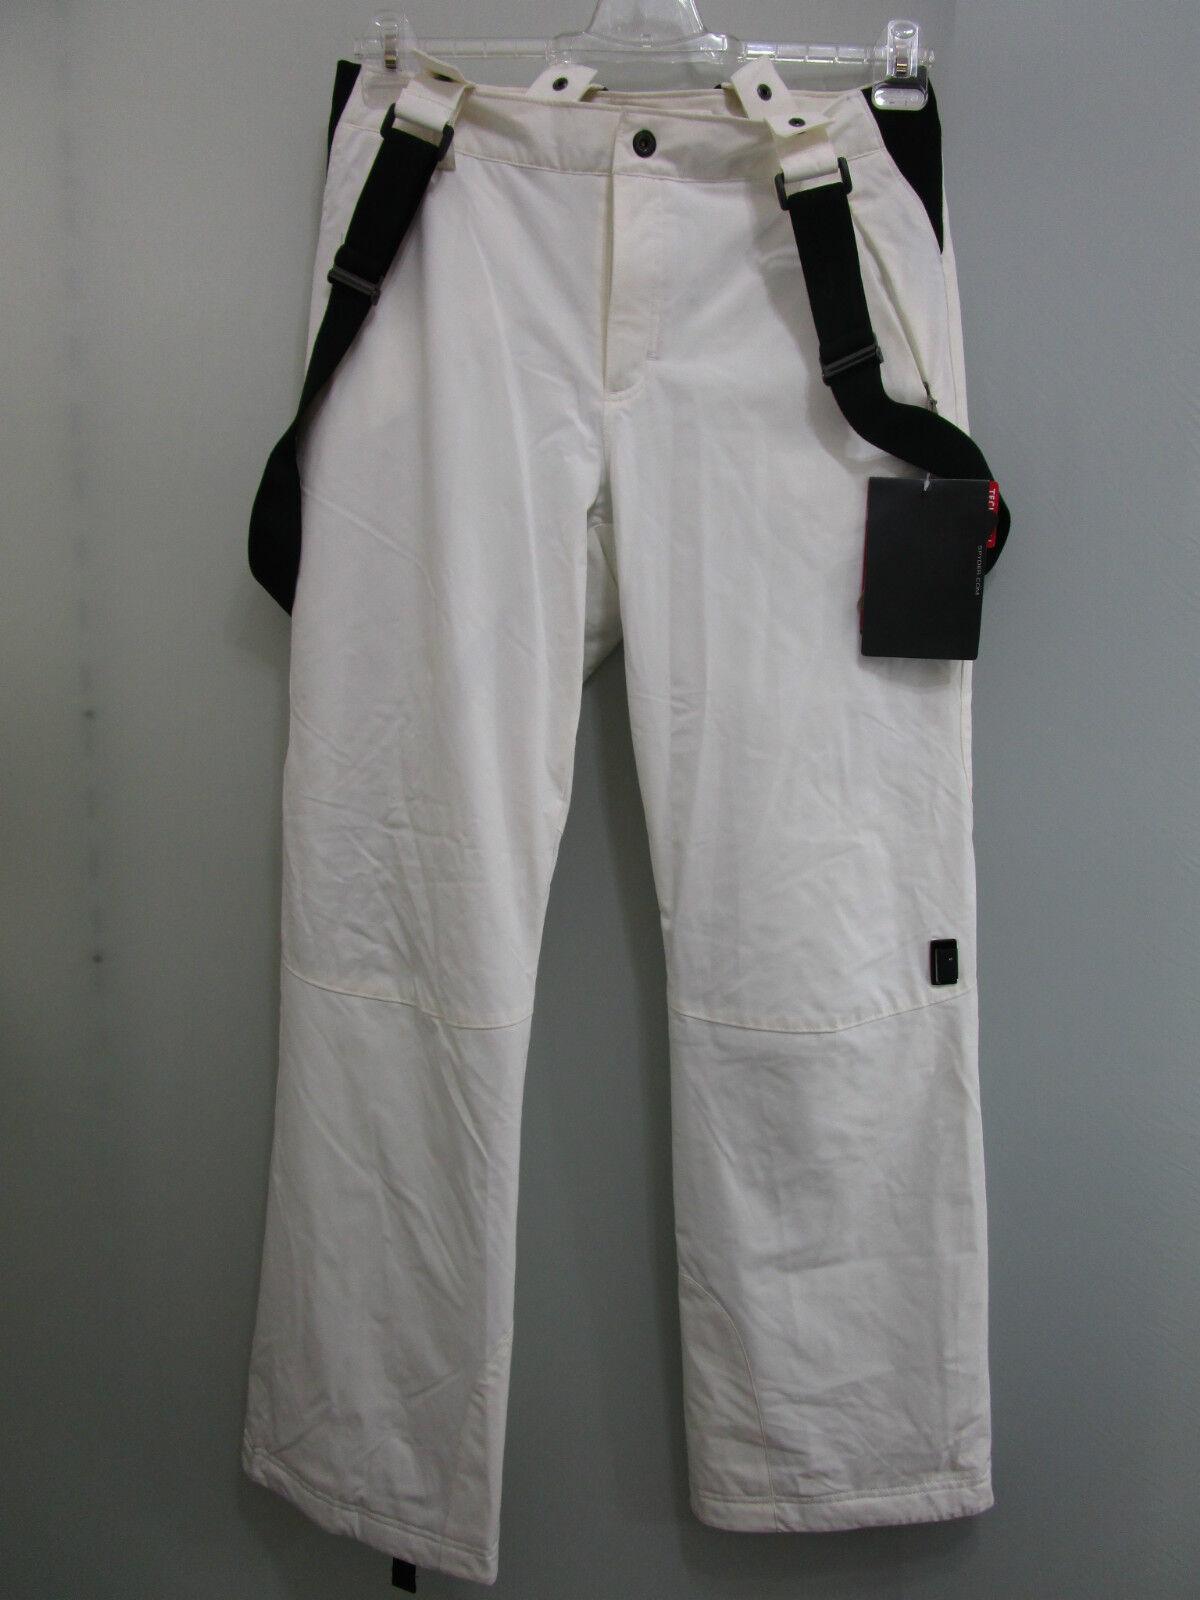 NEU Spyder  14976 Ruby TailGoldt Fit Pant Skihose Größe Größe Größe 42 in Ivory 86aeec